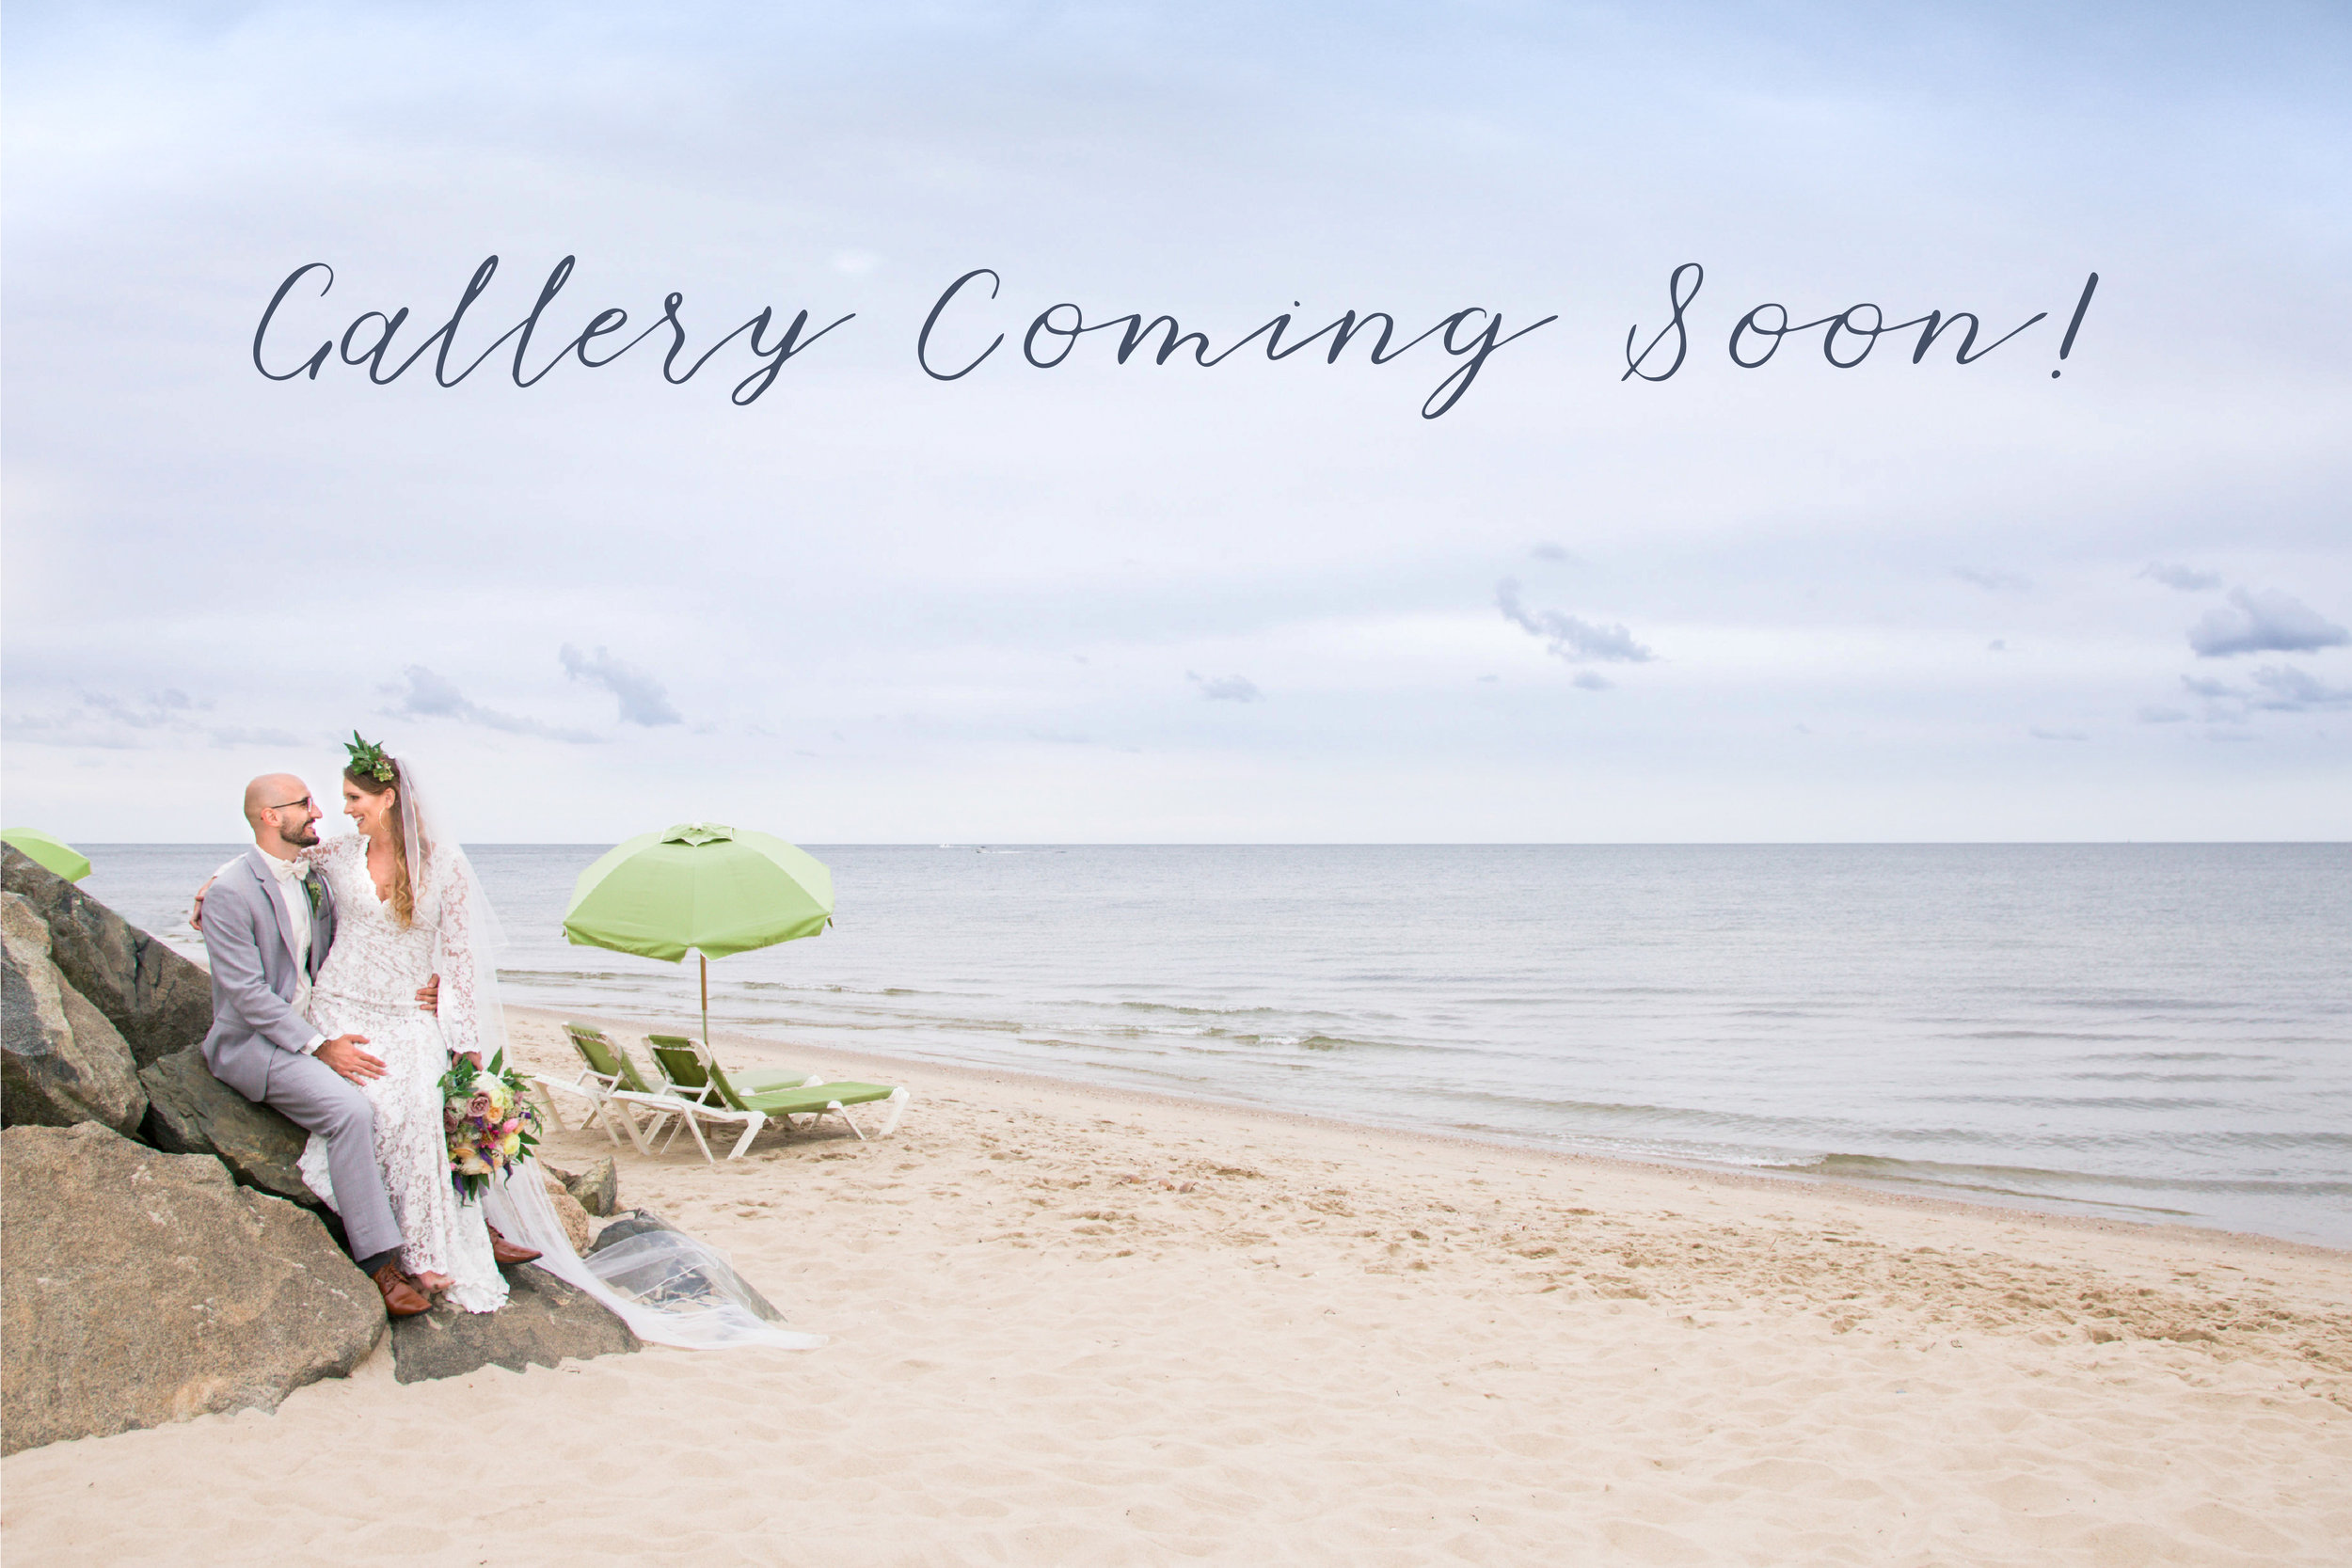 Gina-Gallery-Coming-Soon.jpg